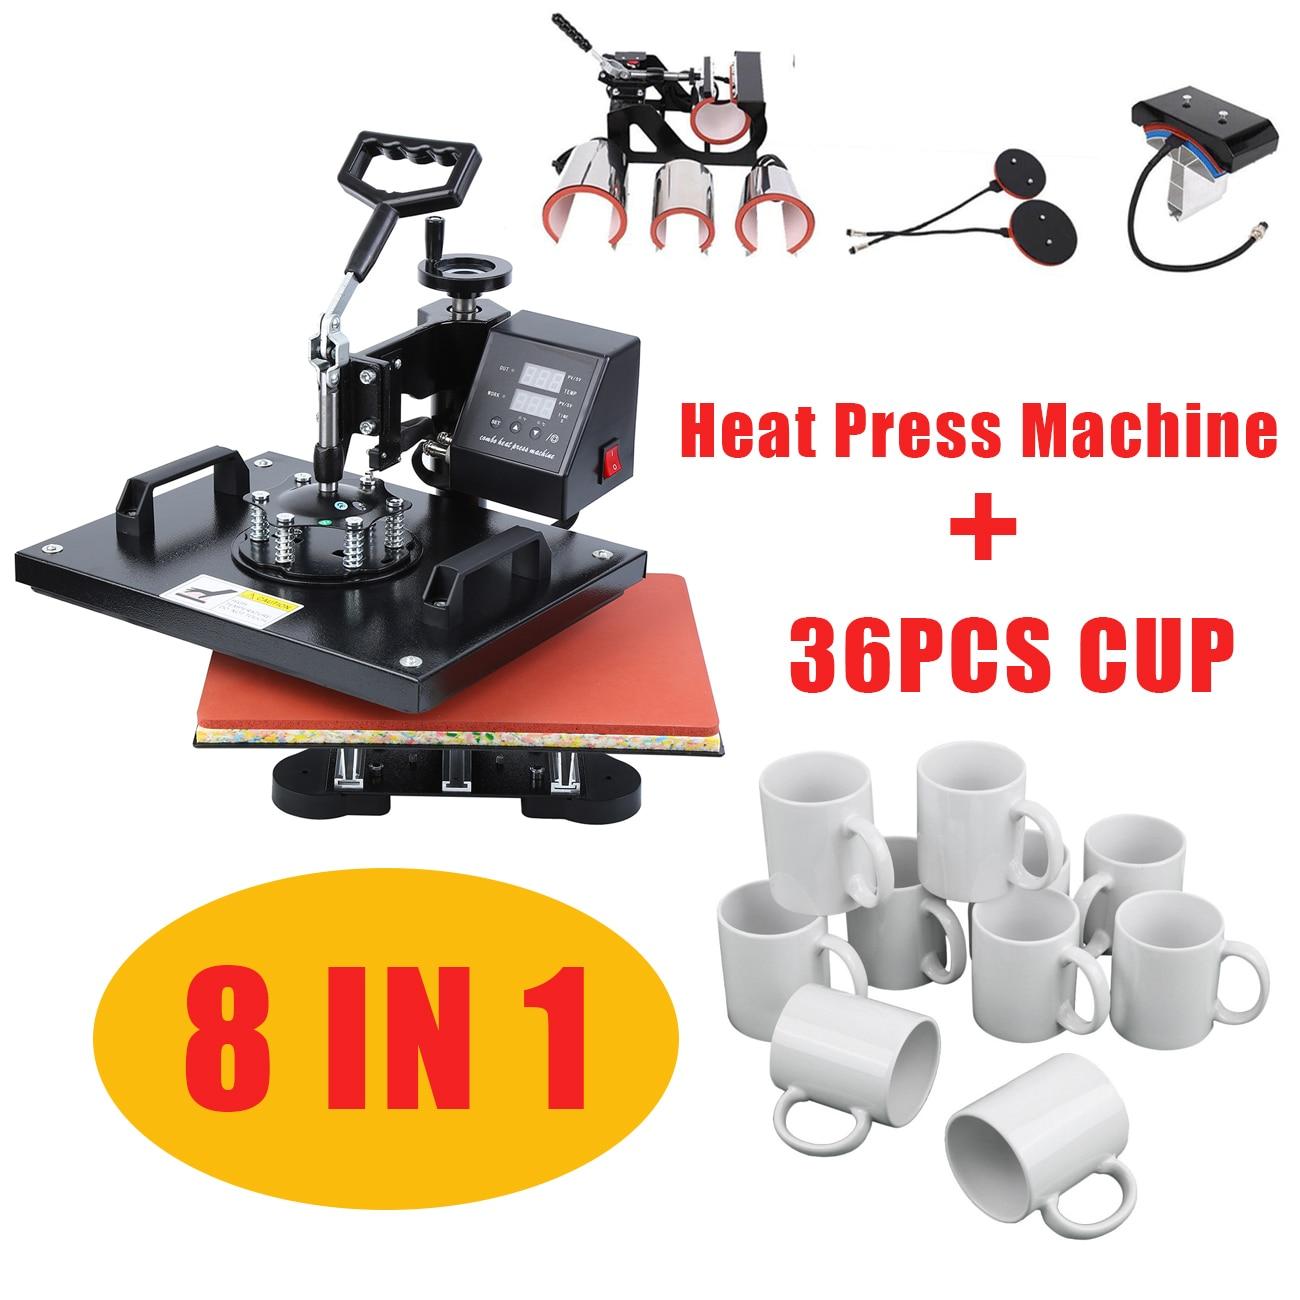 30*38CM/38*38CM 8 In 1 Combo Heat Press Machine Heat Transfer Printer Muntifunctional Sublimation For T-shirt Mug Hat Plate Cap